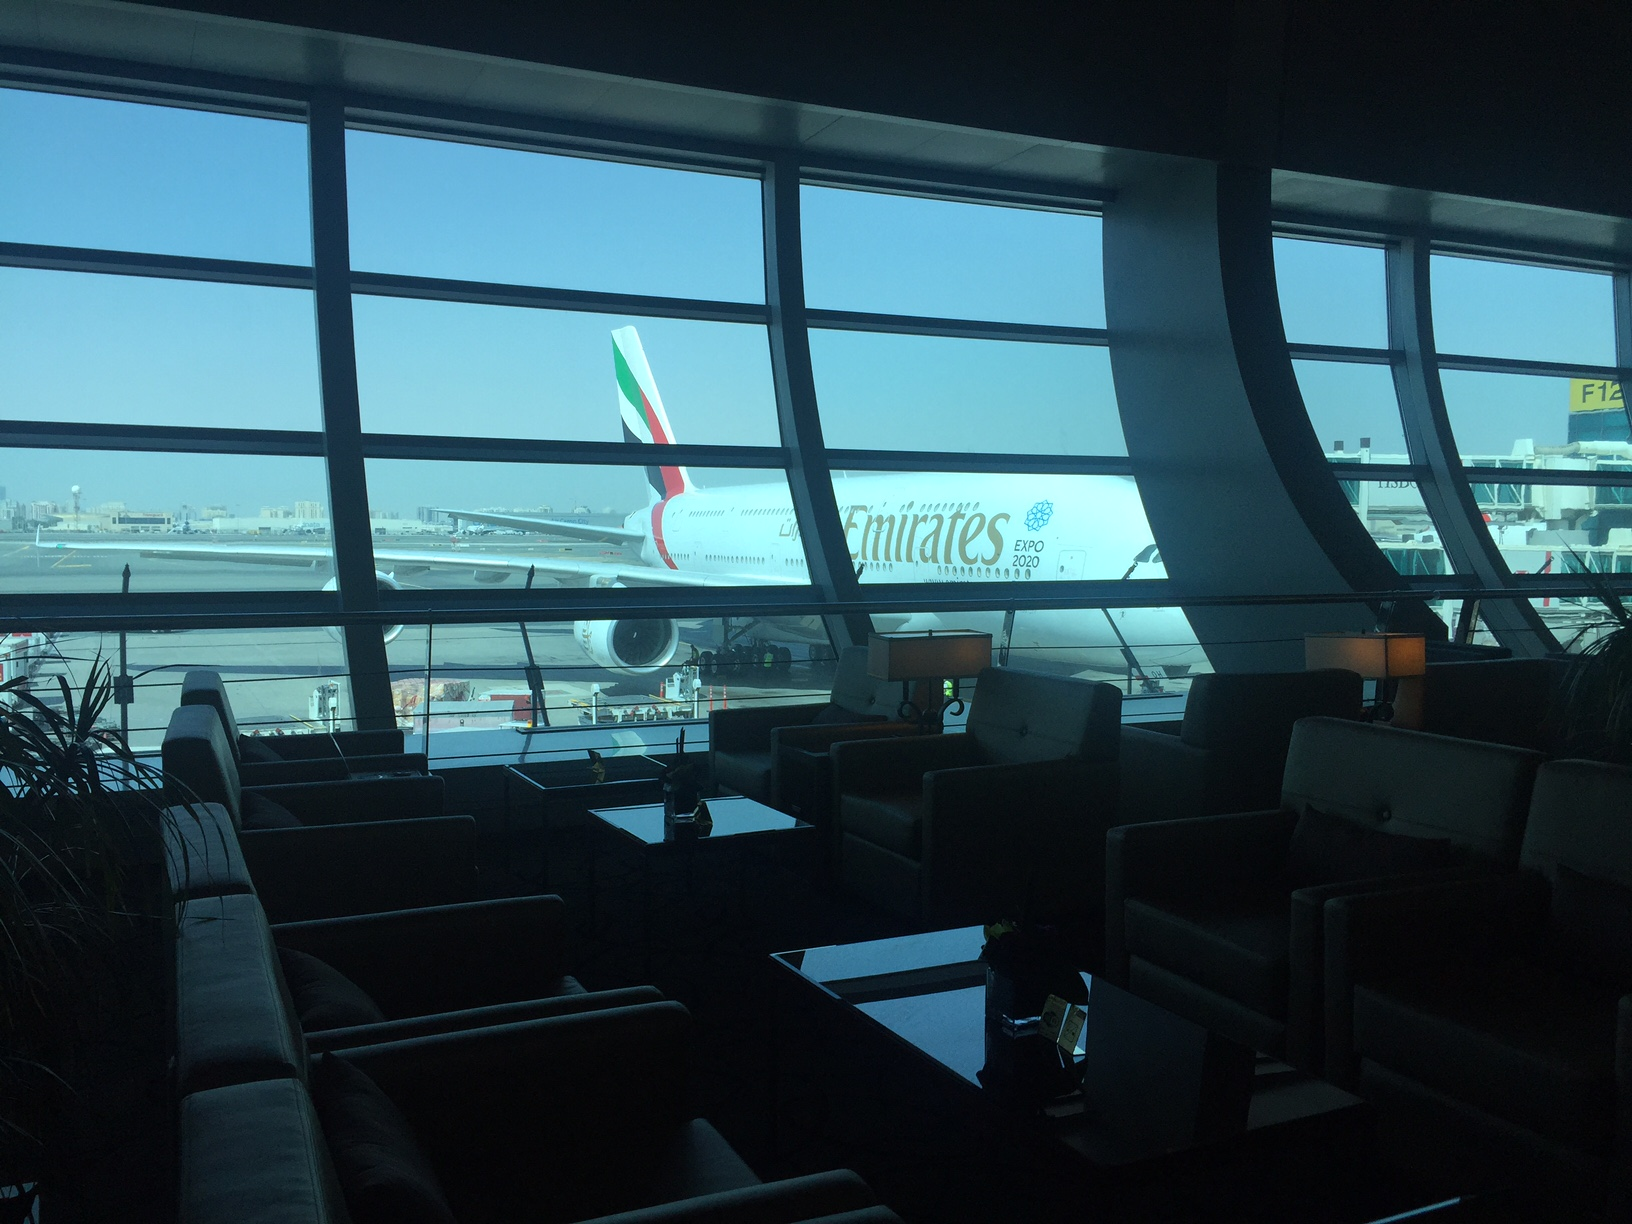 Emirates First Class Lounge Dubai Airport